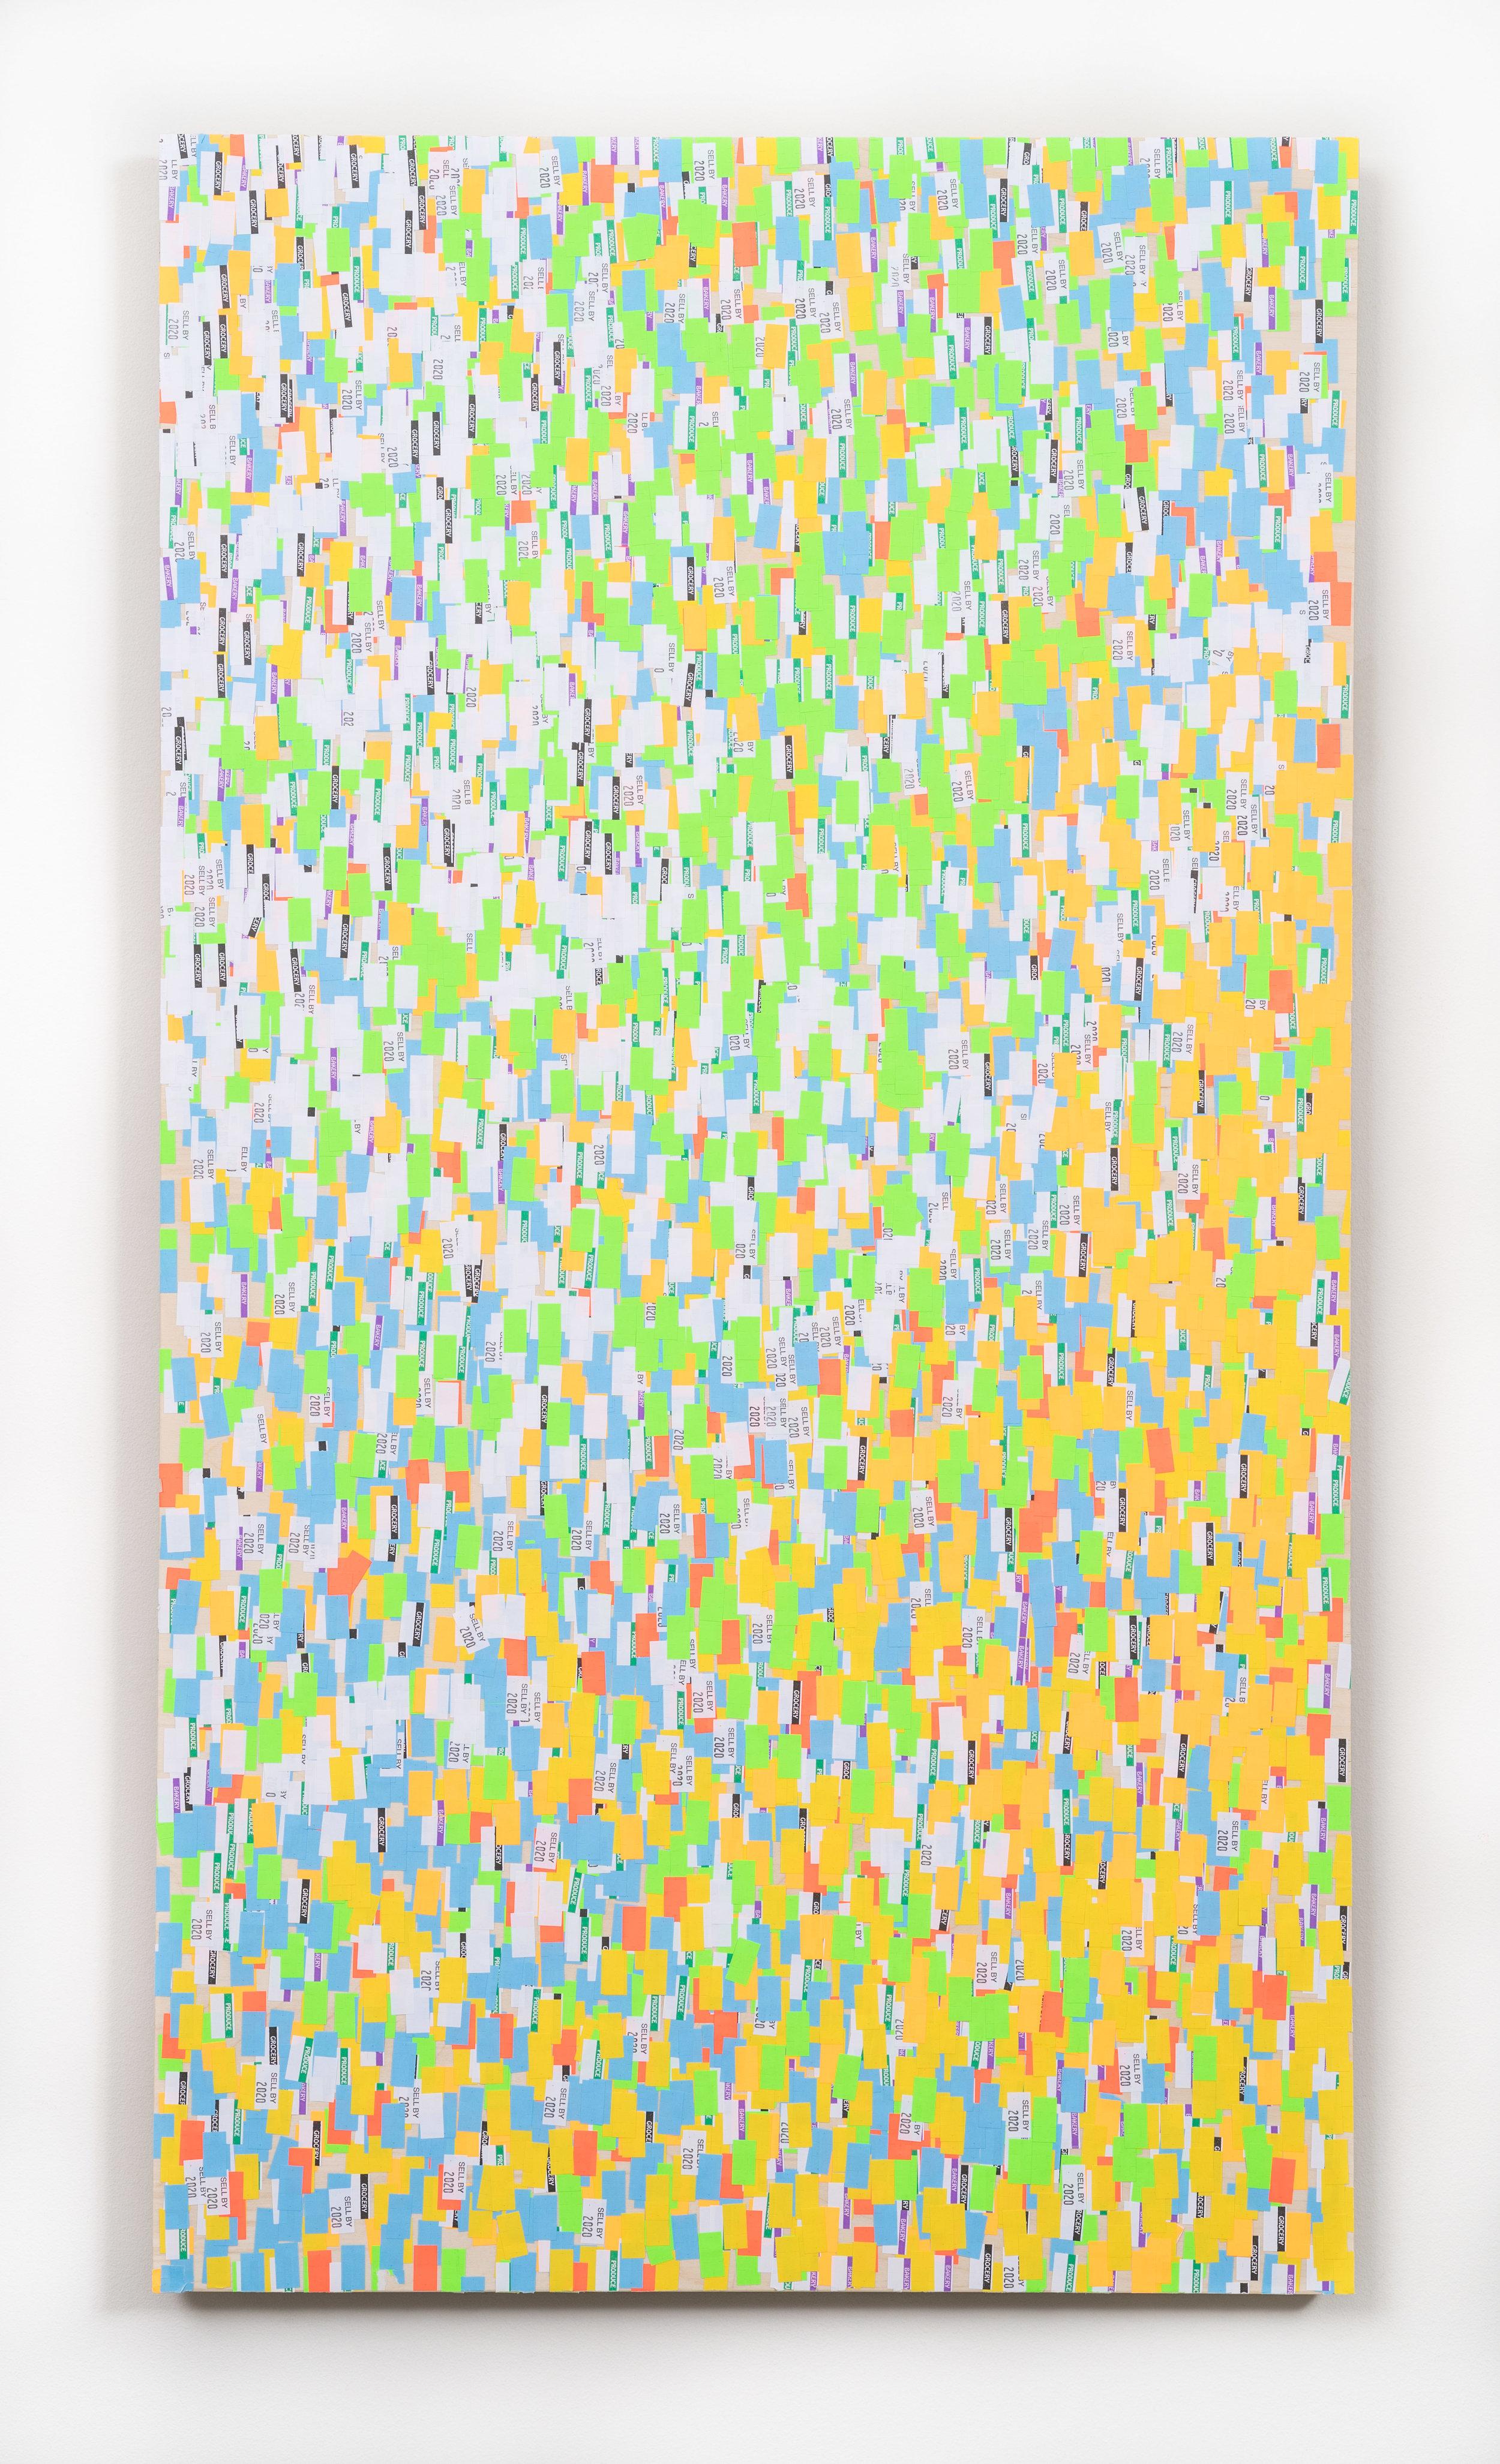 the bodega paintings, 2018